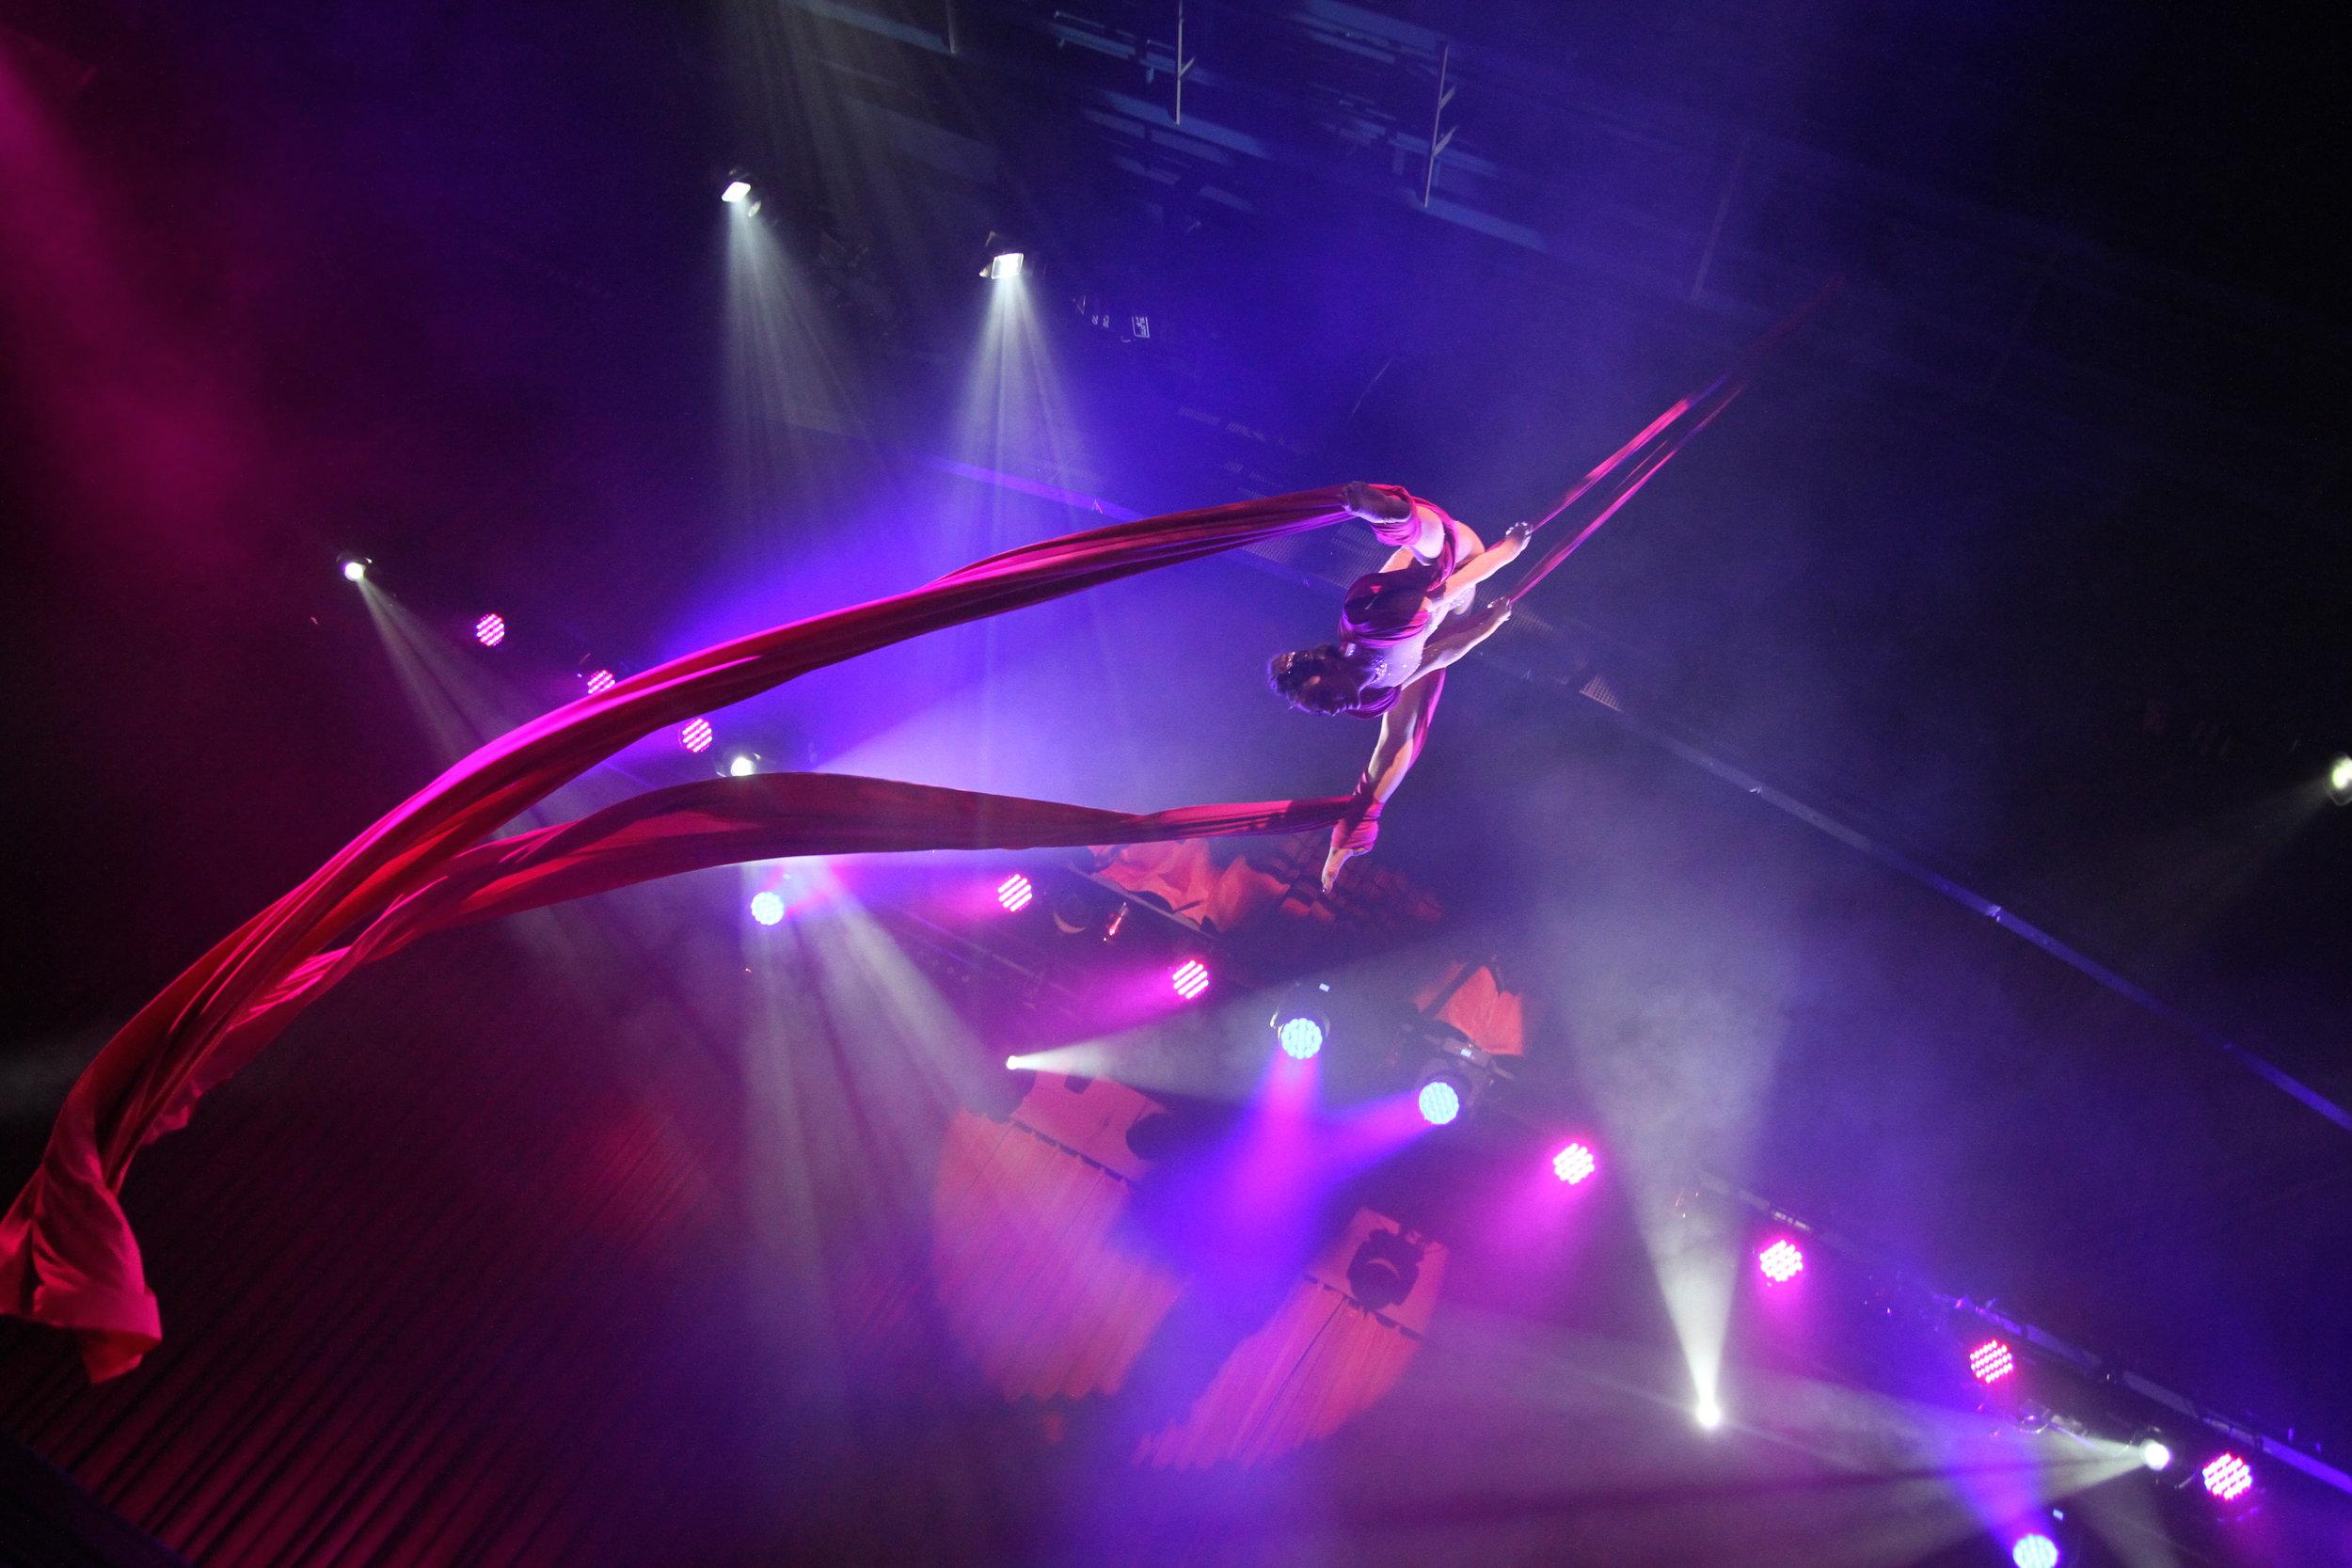 Aircandy. Vertikaltuch Performance. Luftartistin Berlin. Aerialist. Aerial Silk Berlin